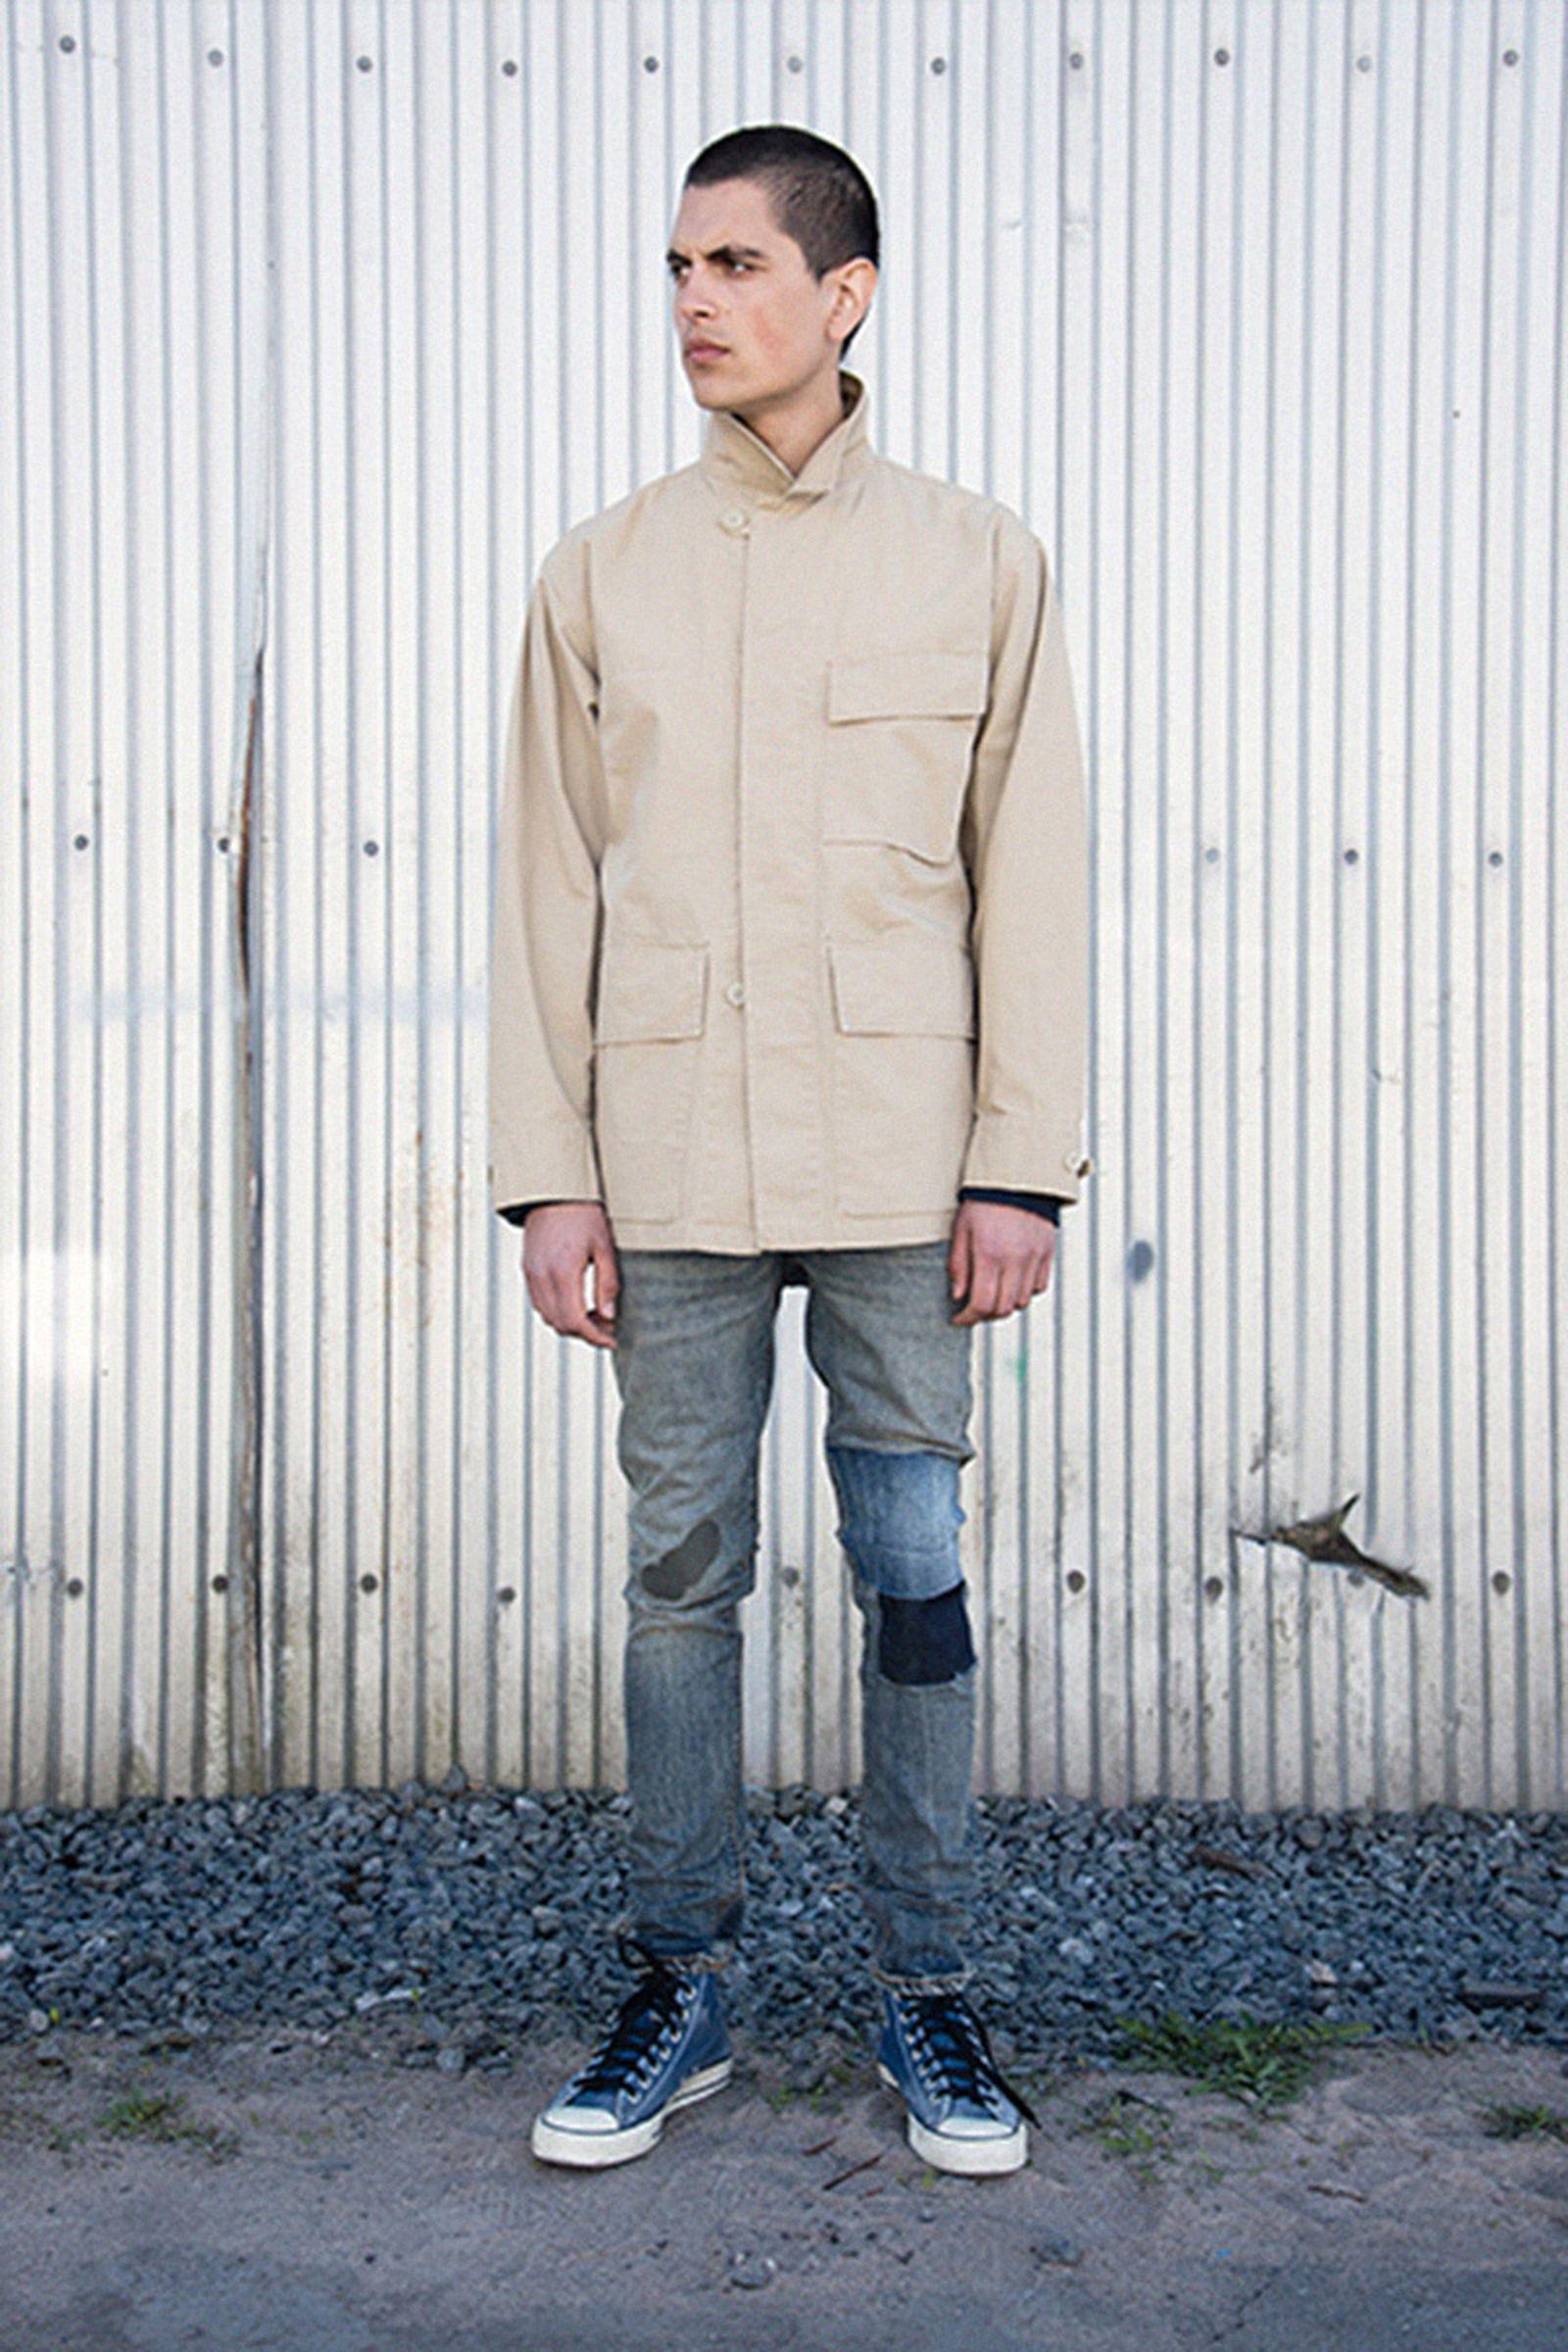 best sustainable fashion brands nudiejeans Armedangels Jungmaven Knowledge Cotton Apparel